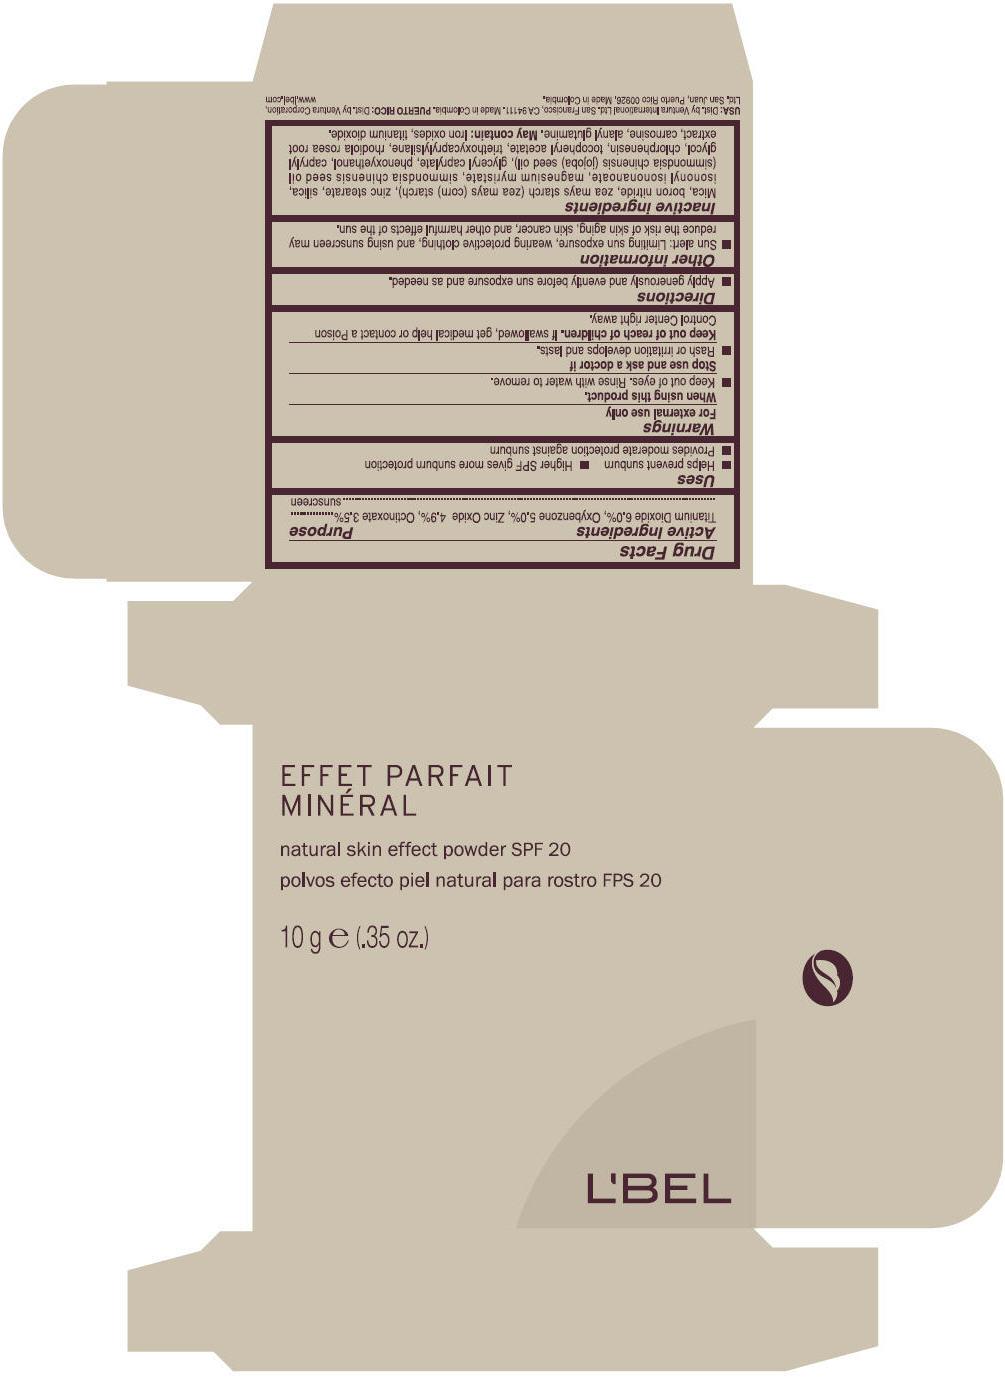 Lbel (Titanium Dioxide, Oxybenzone, Zinc Oxide, And Octinoxate) Powder [Ventura International, Limited]